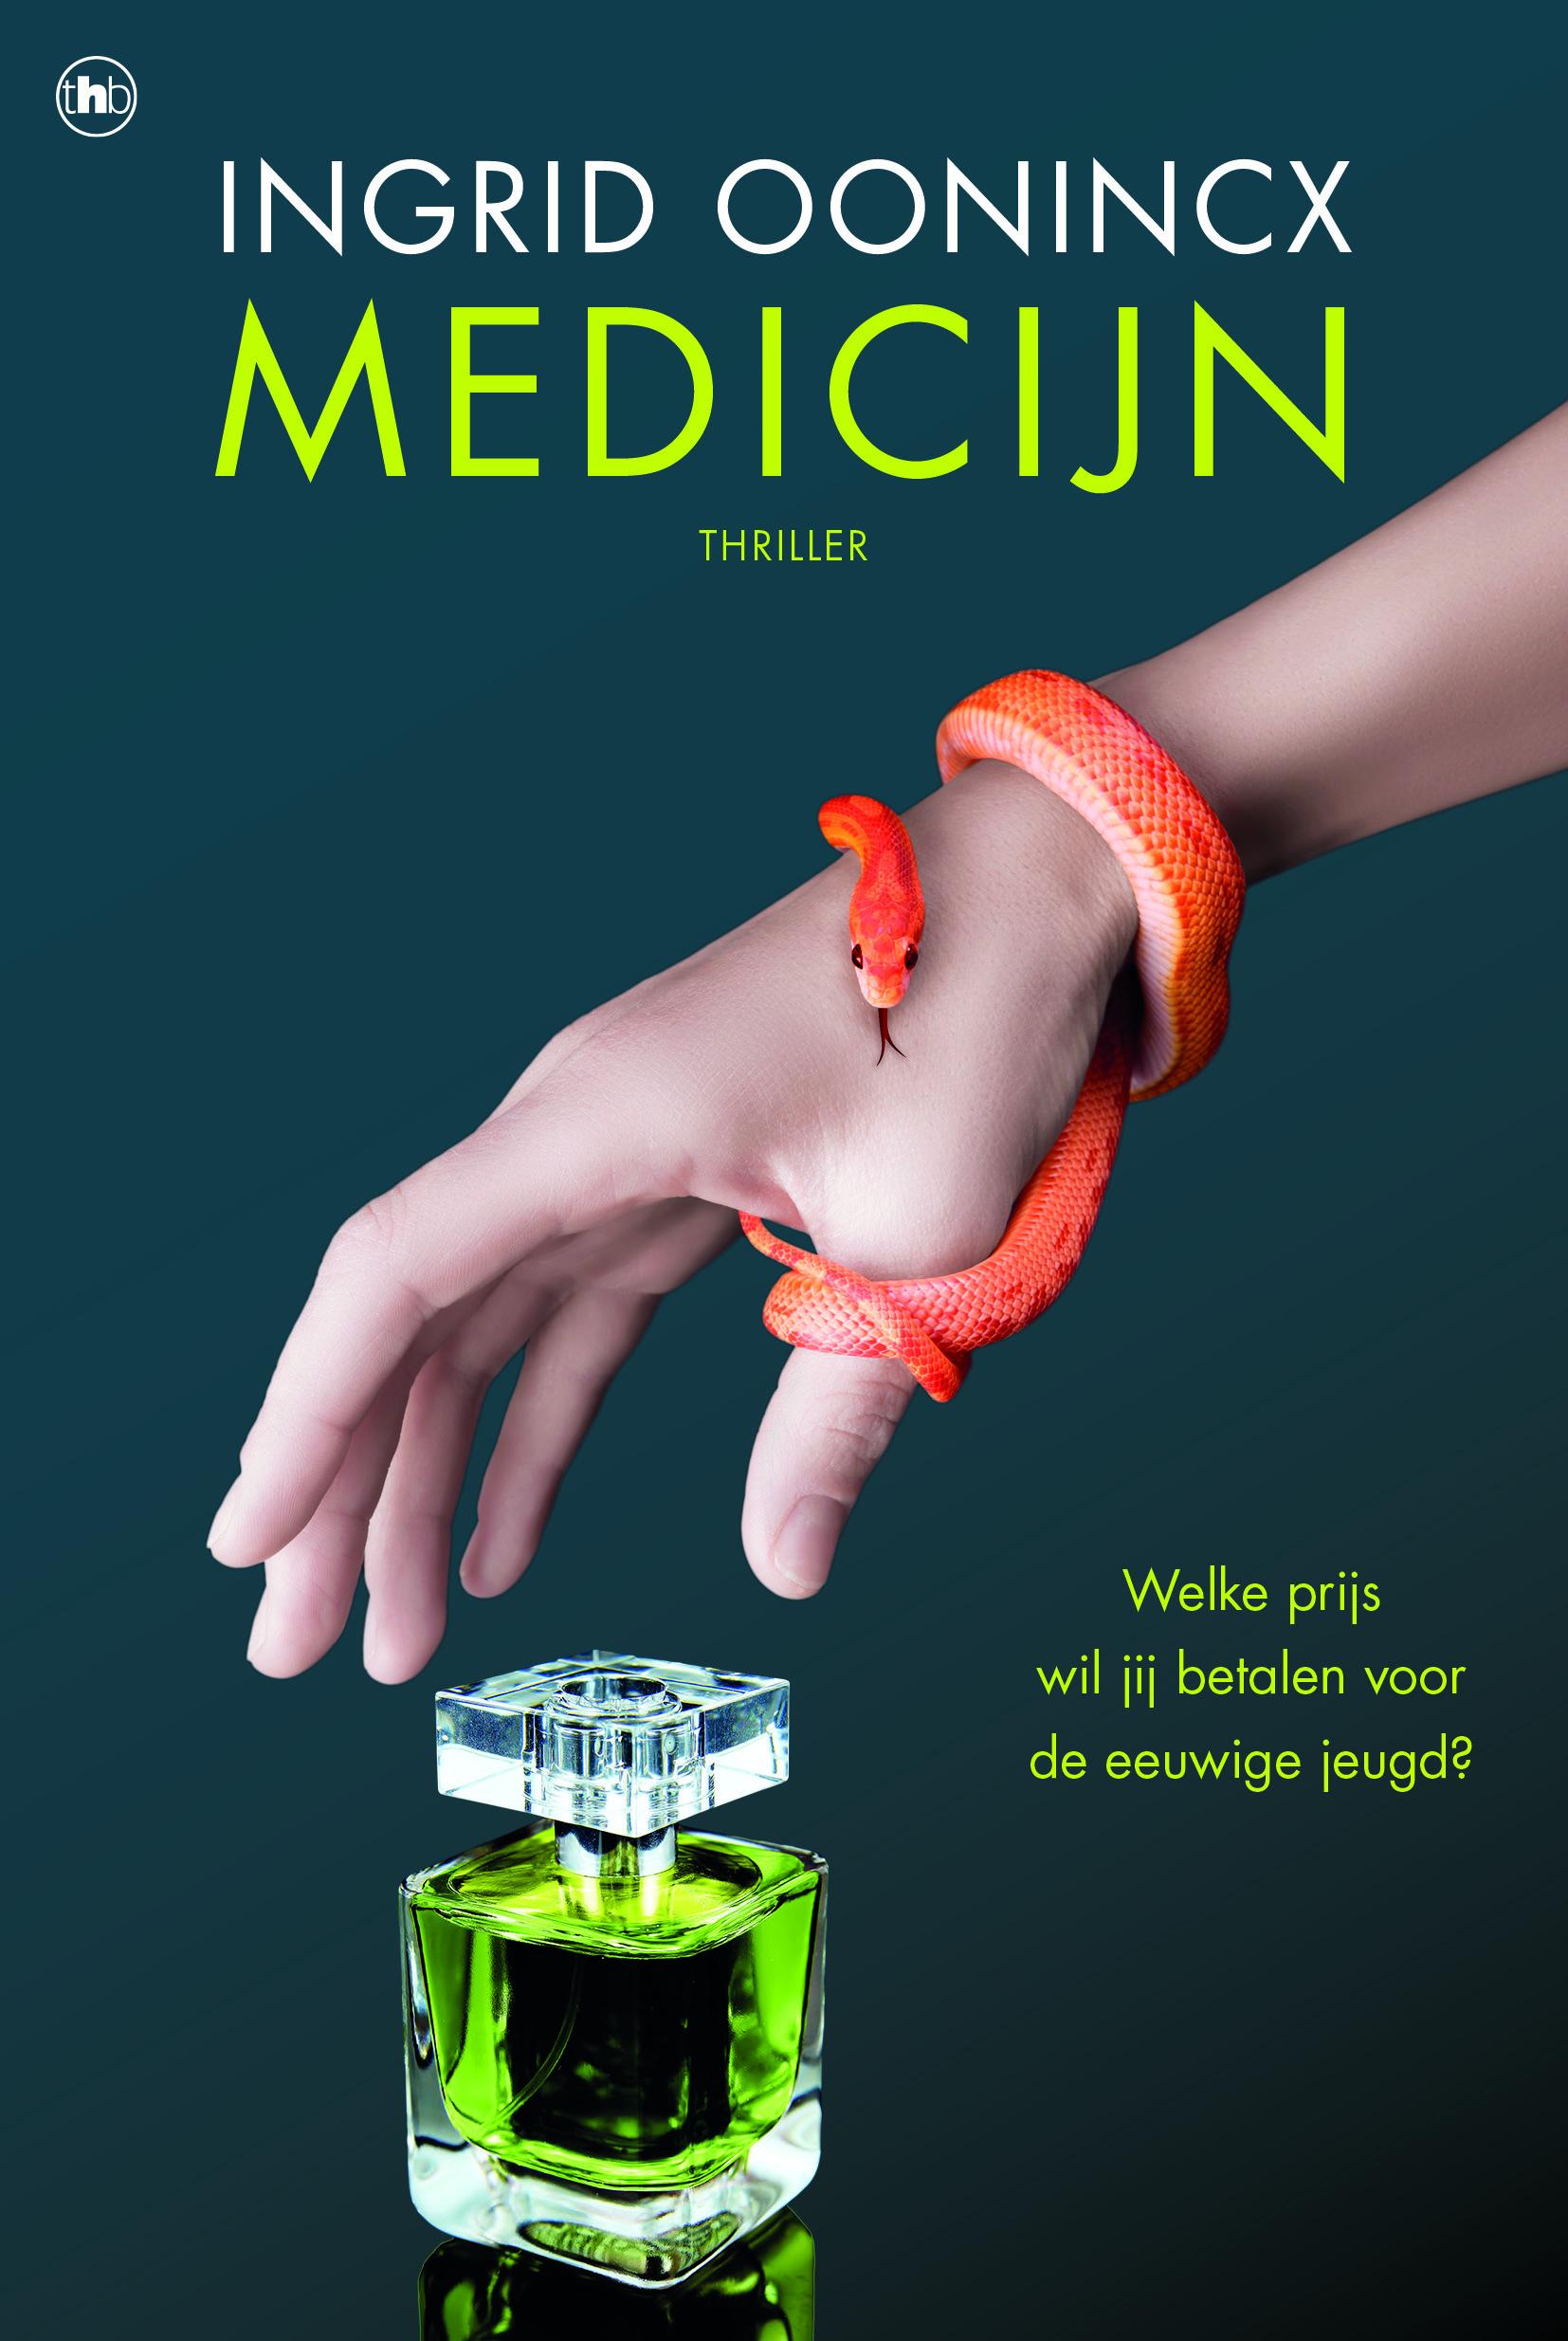 Medicijn – Ingrid Oonincx